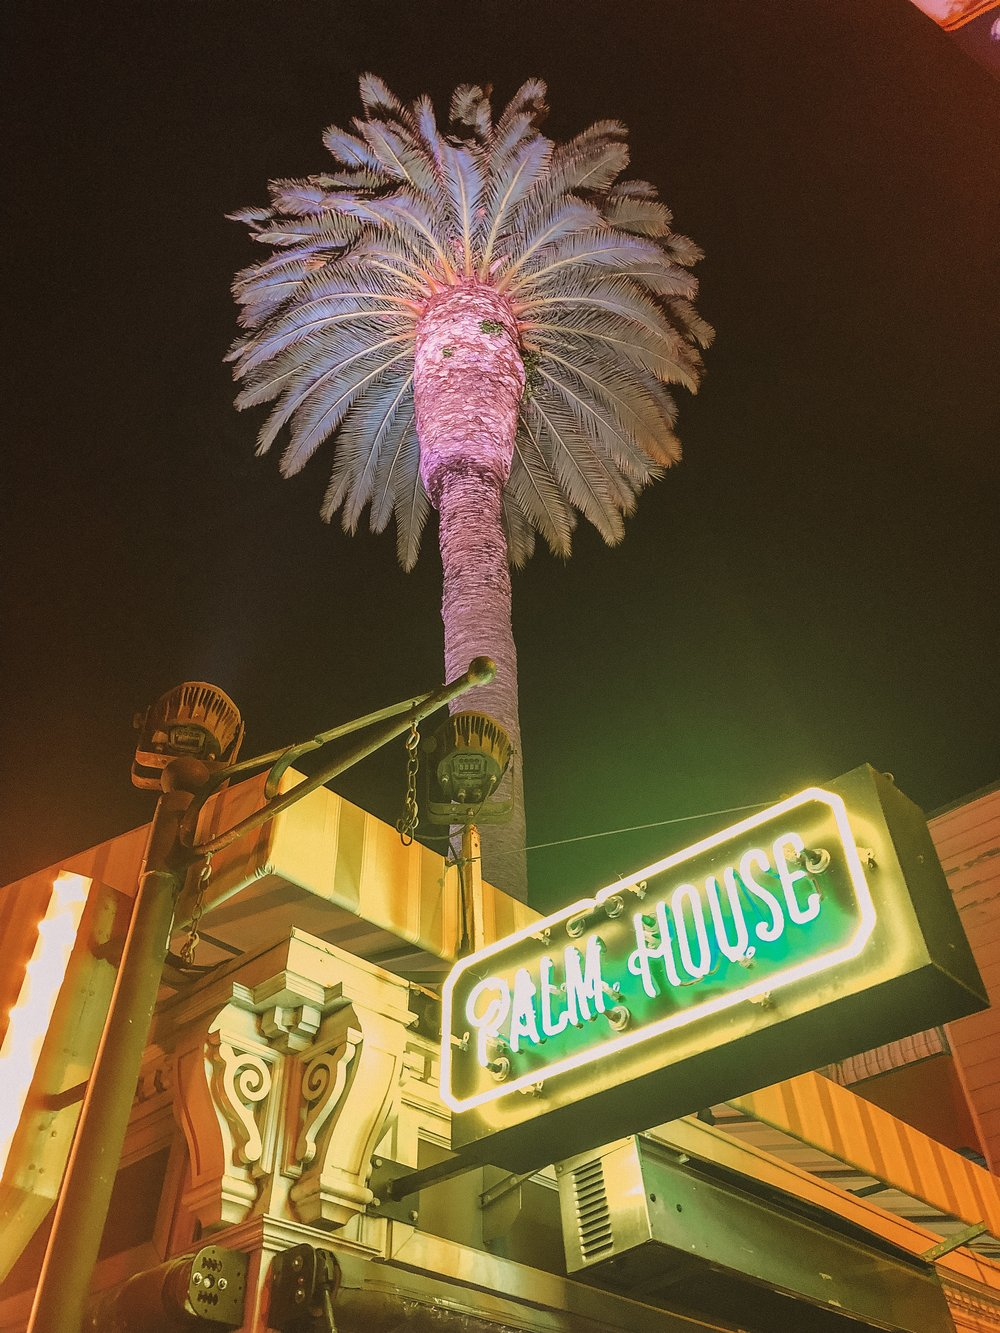 palm-house-restaurant.jpg